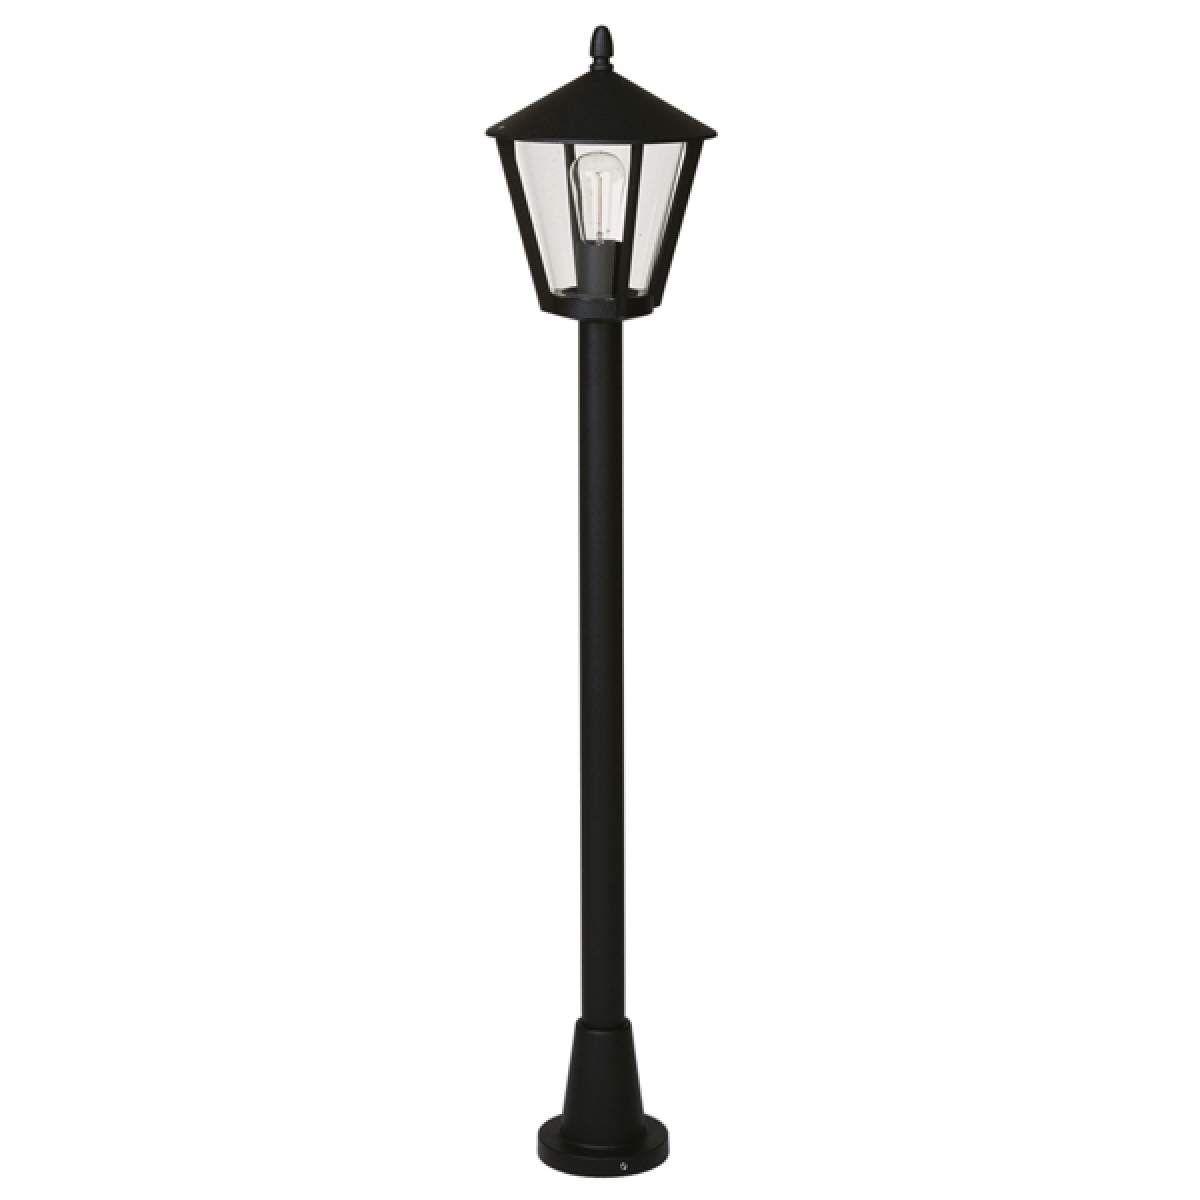 NoirLuminaires Salon Lampadaire Lampe 677 Rustique Ov0Nnm8w